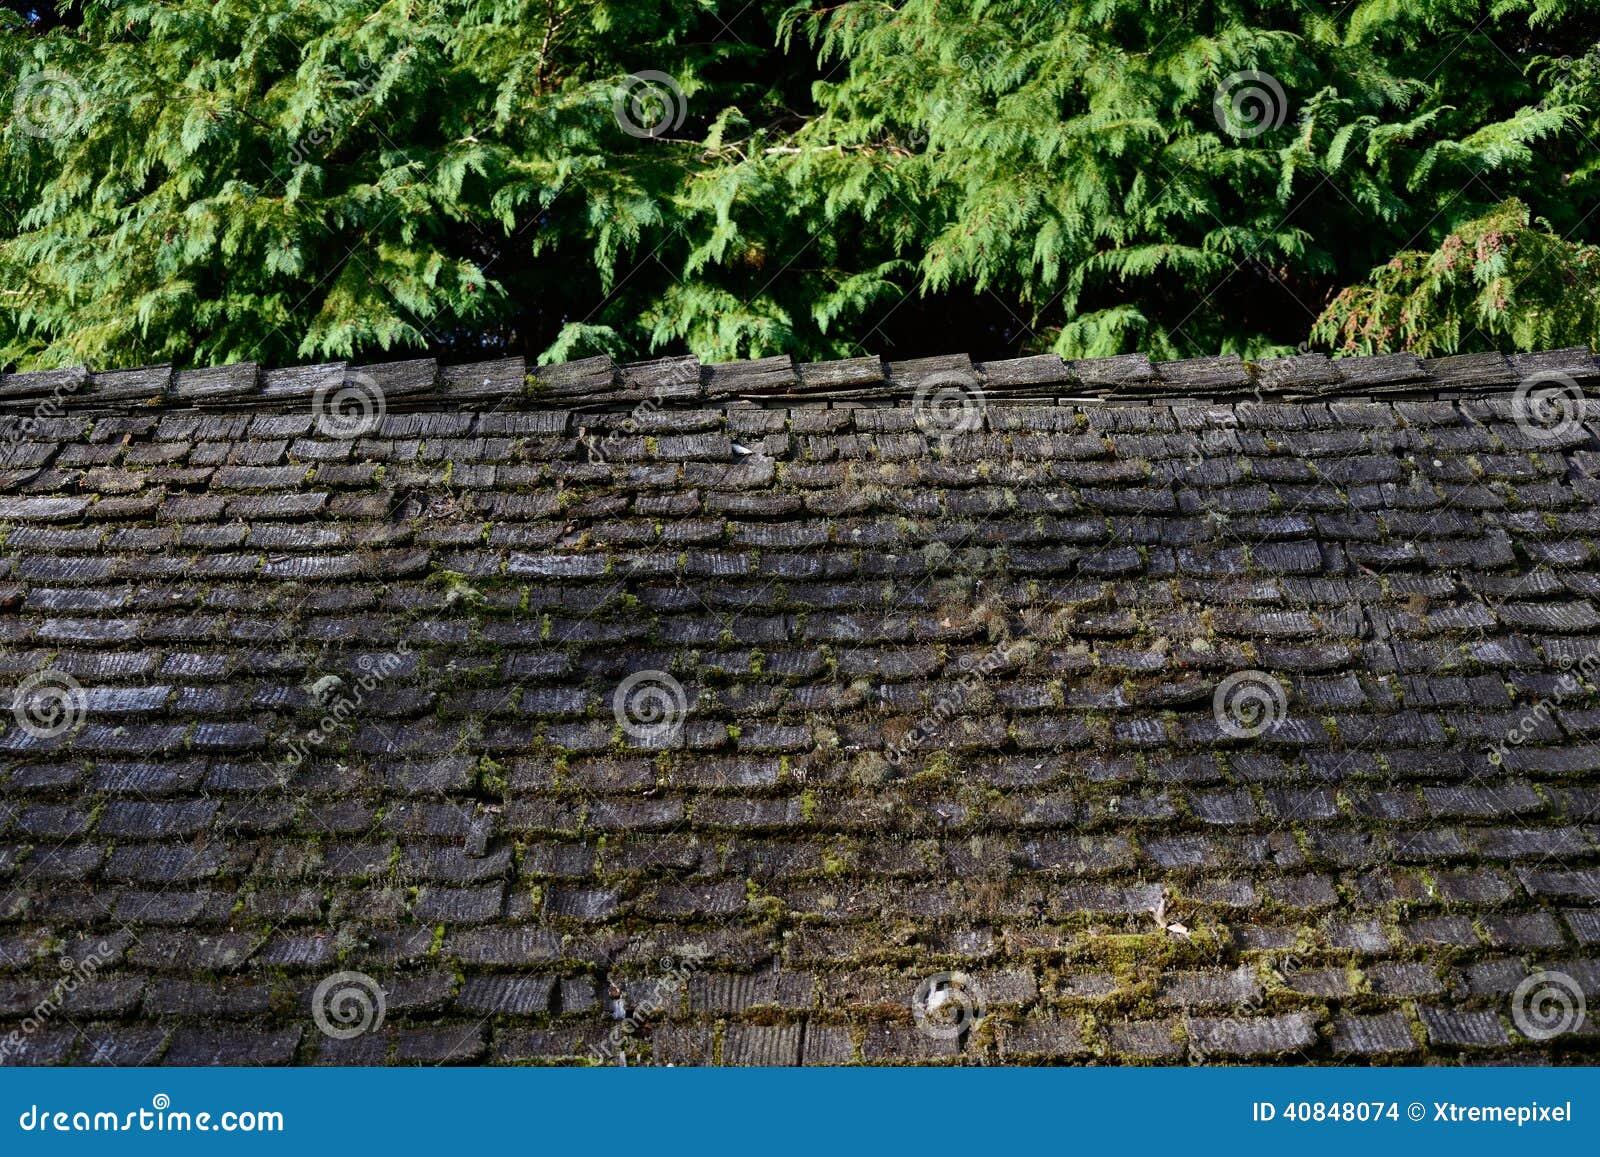 Moss covered shingle roof